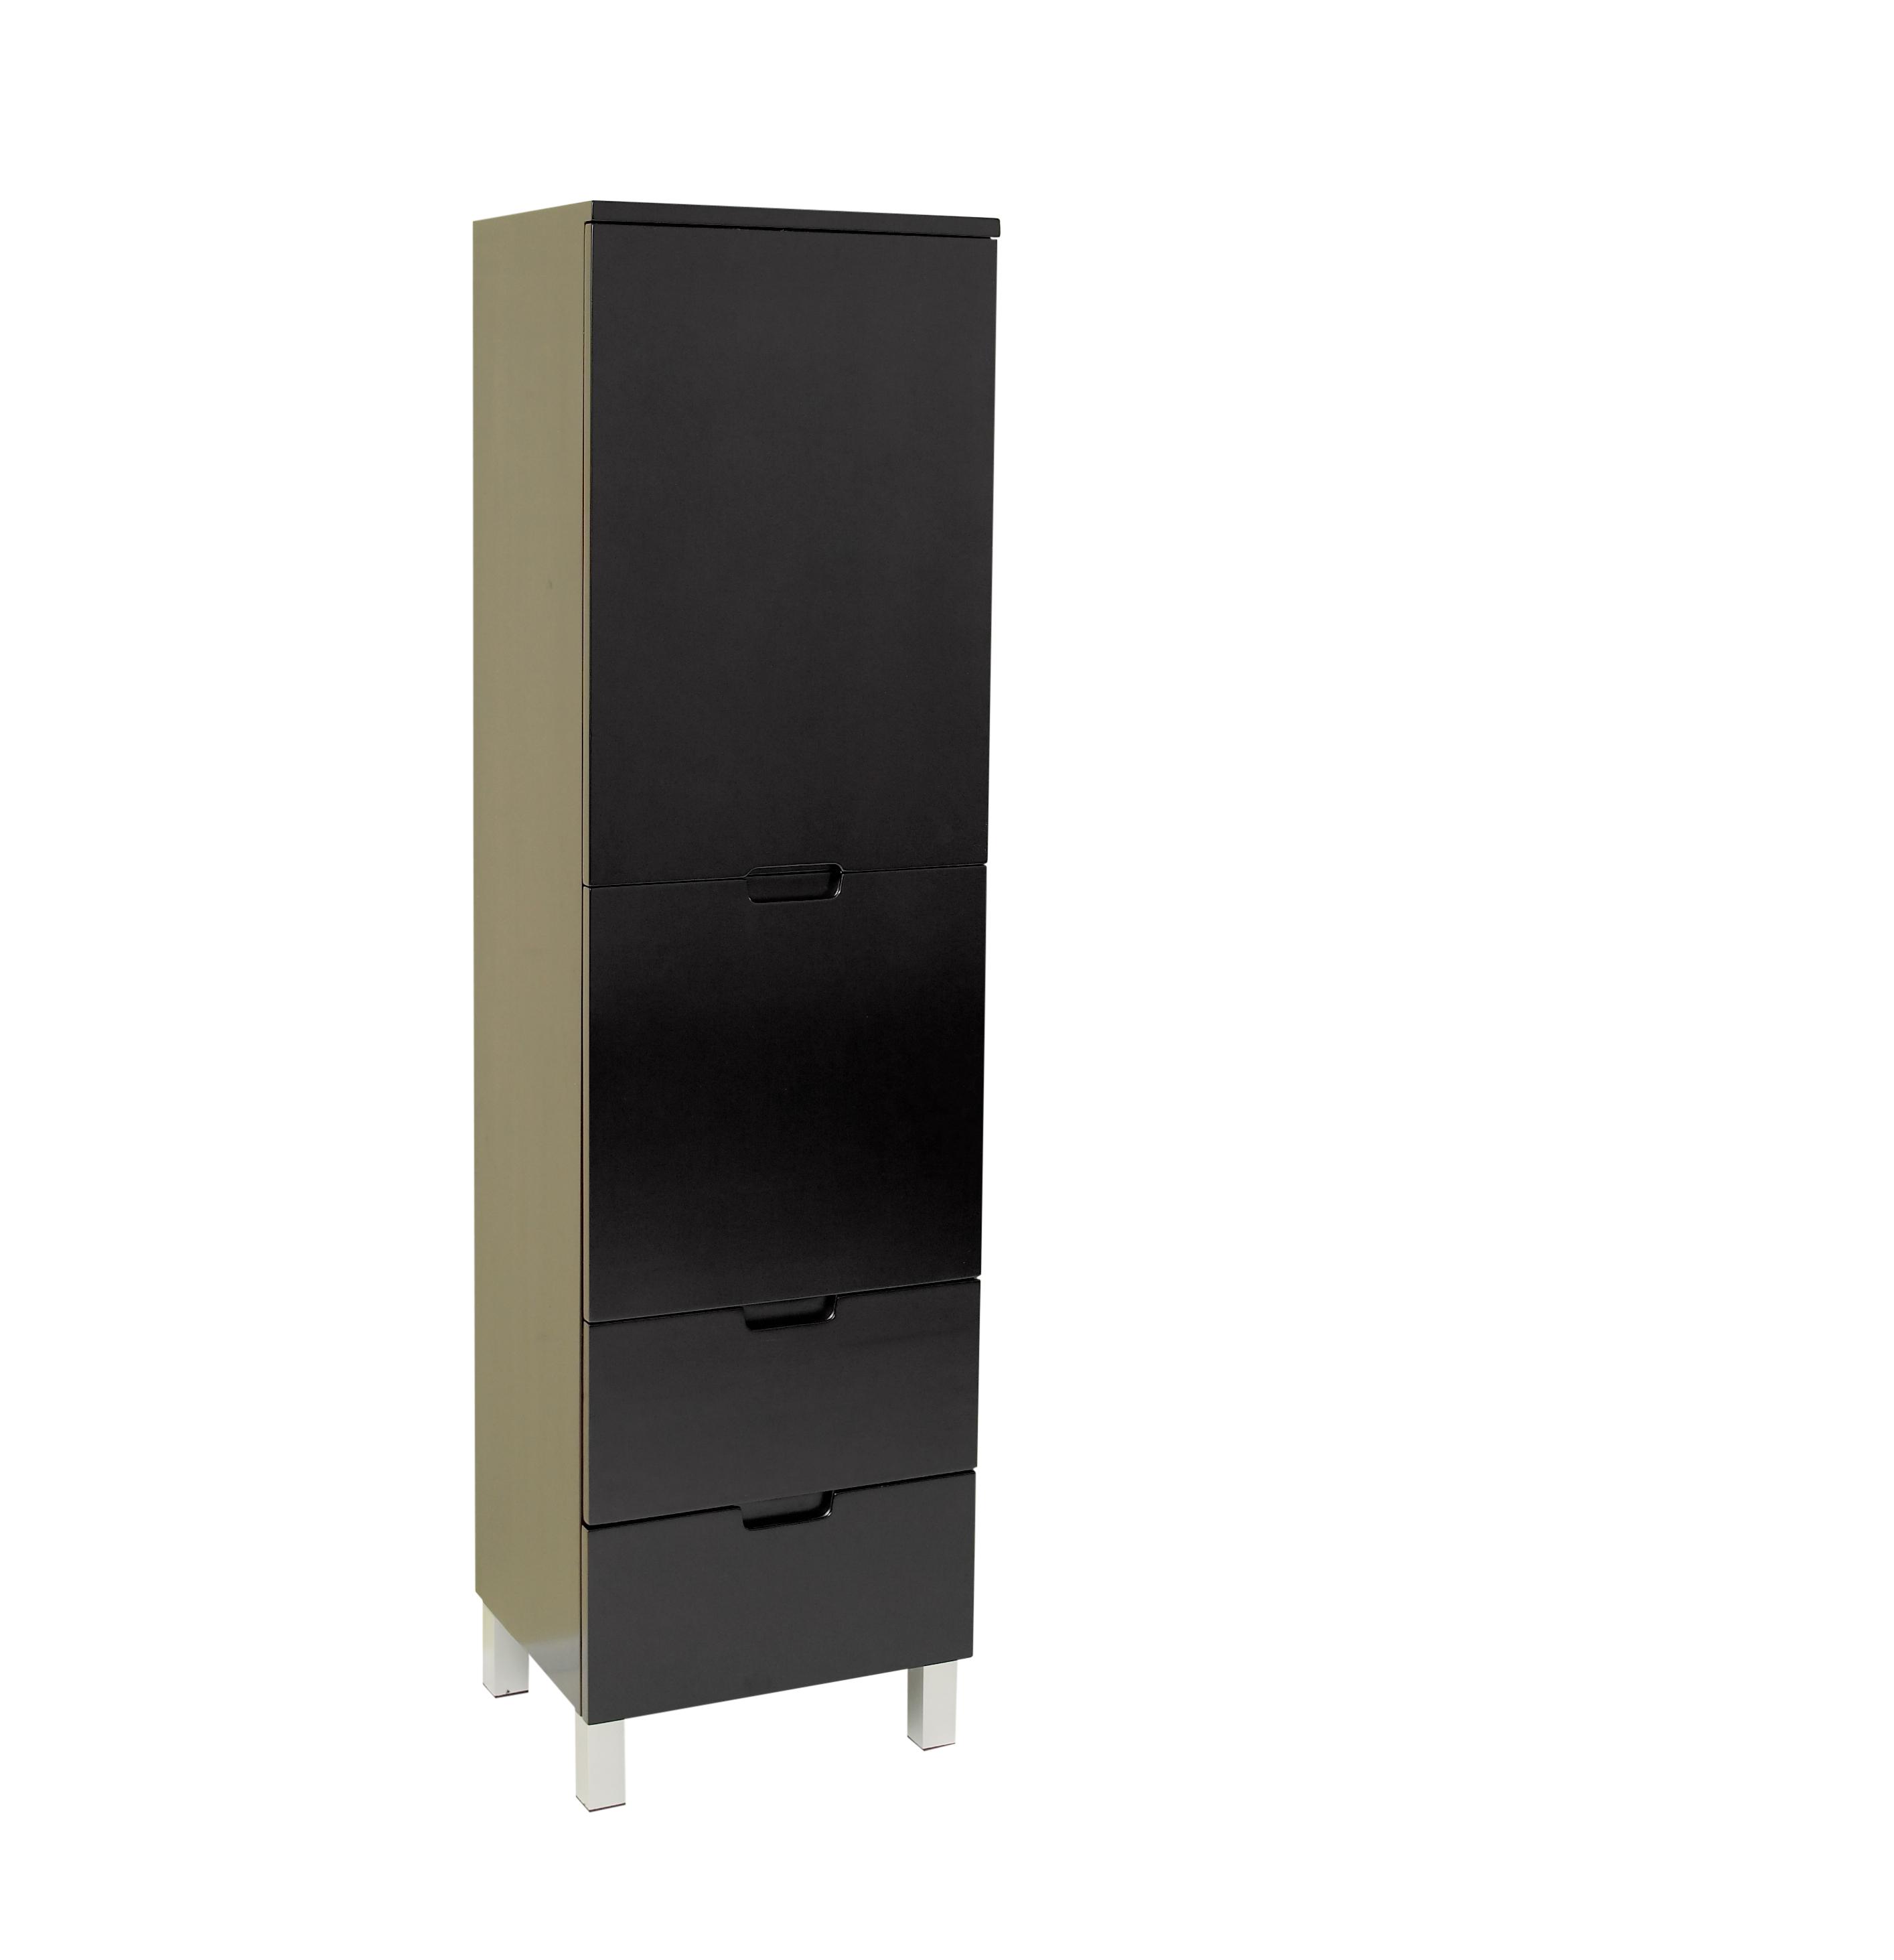 fresca espresso bathroom linen side cabinet w 4 storage areas